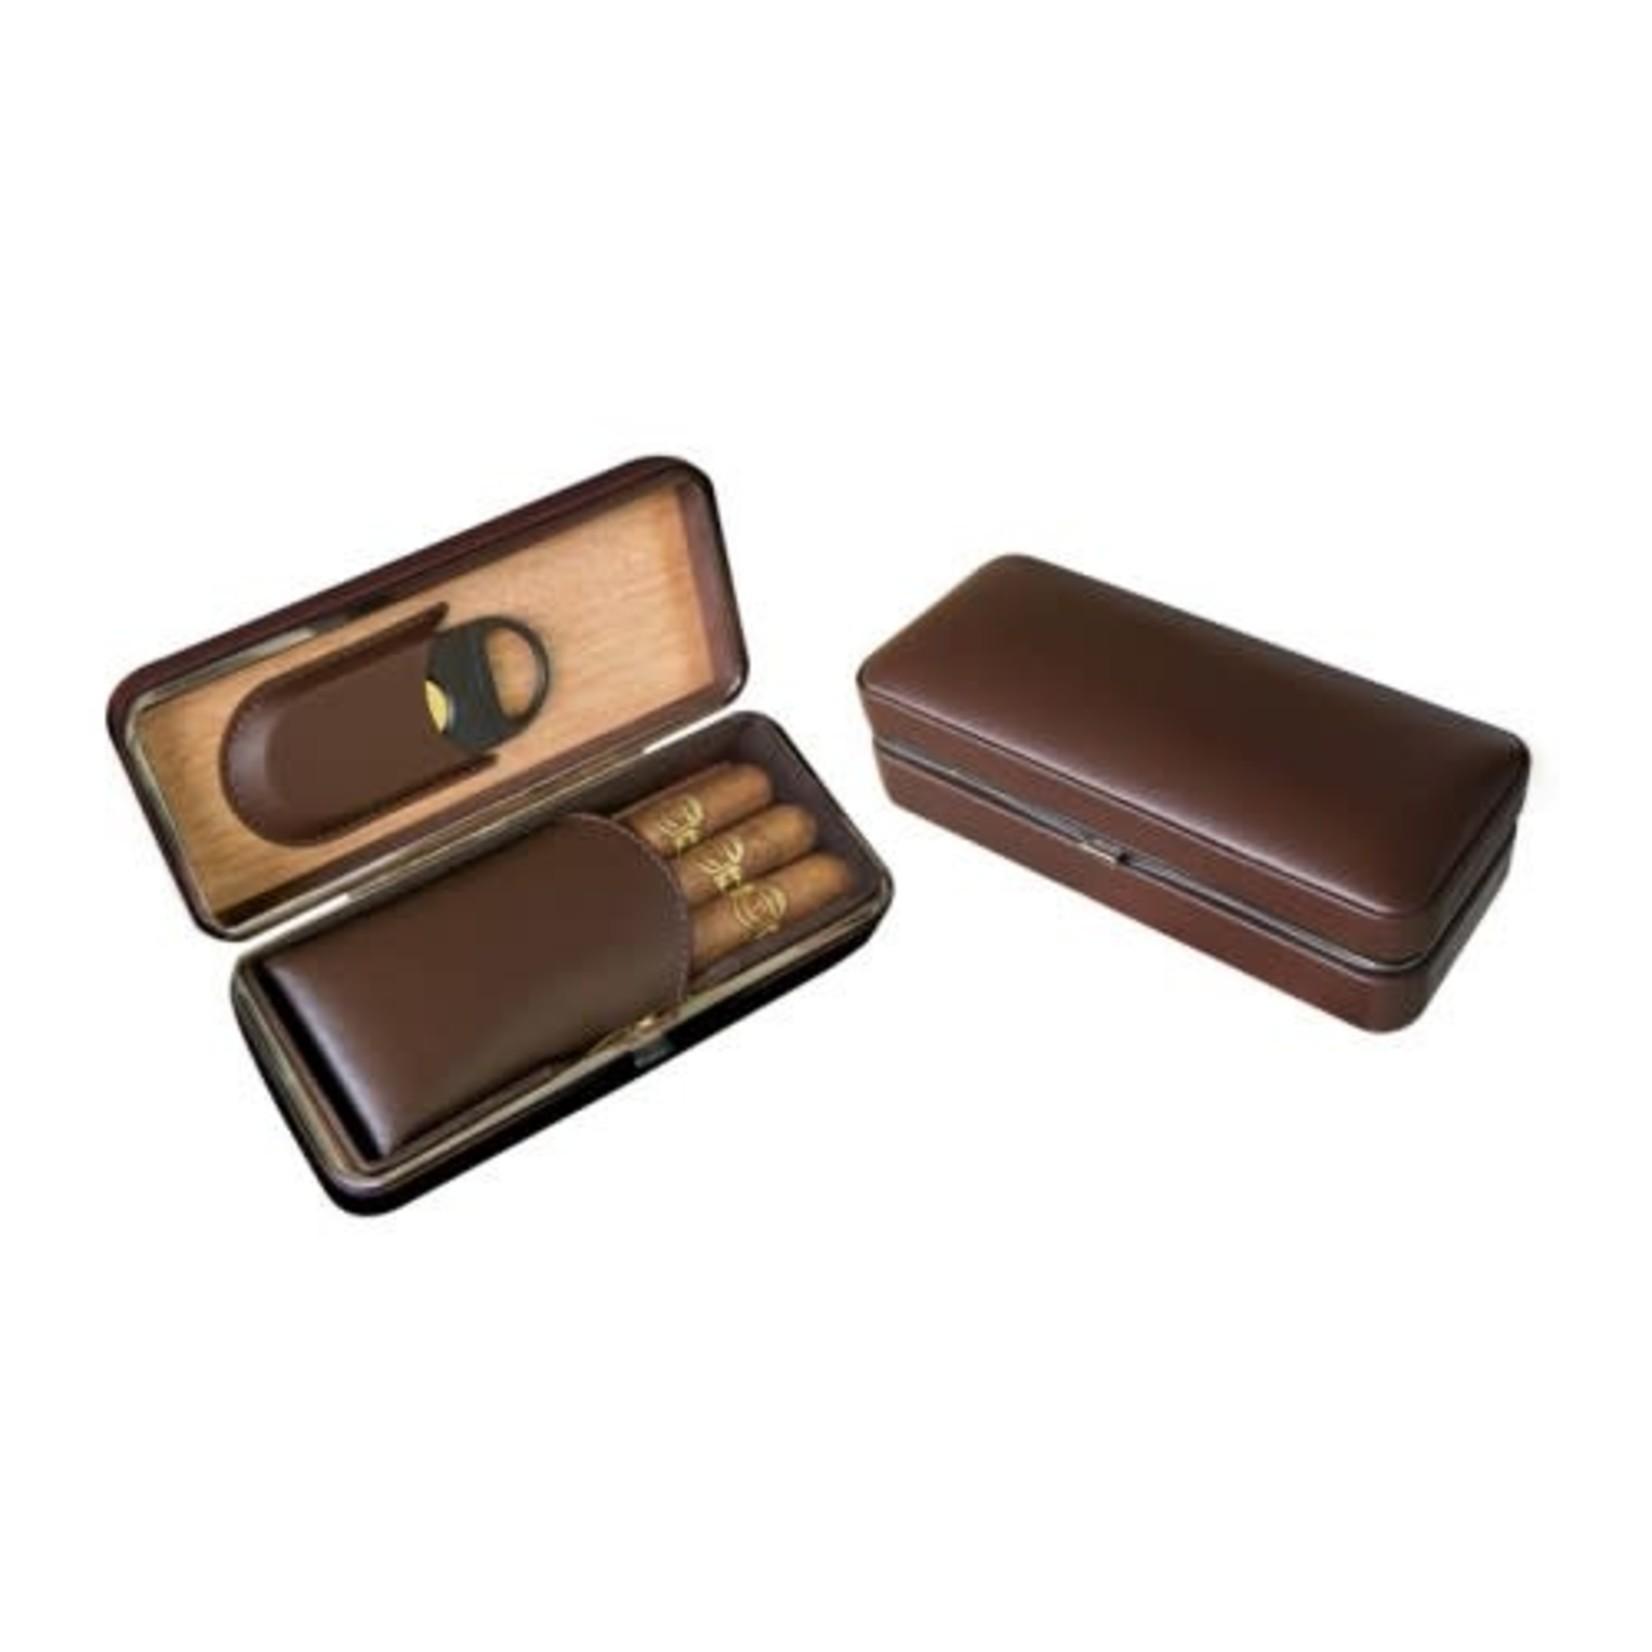 Prestige Import Group 3-cigar Folding Case